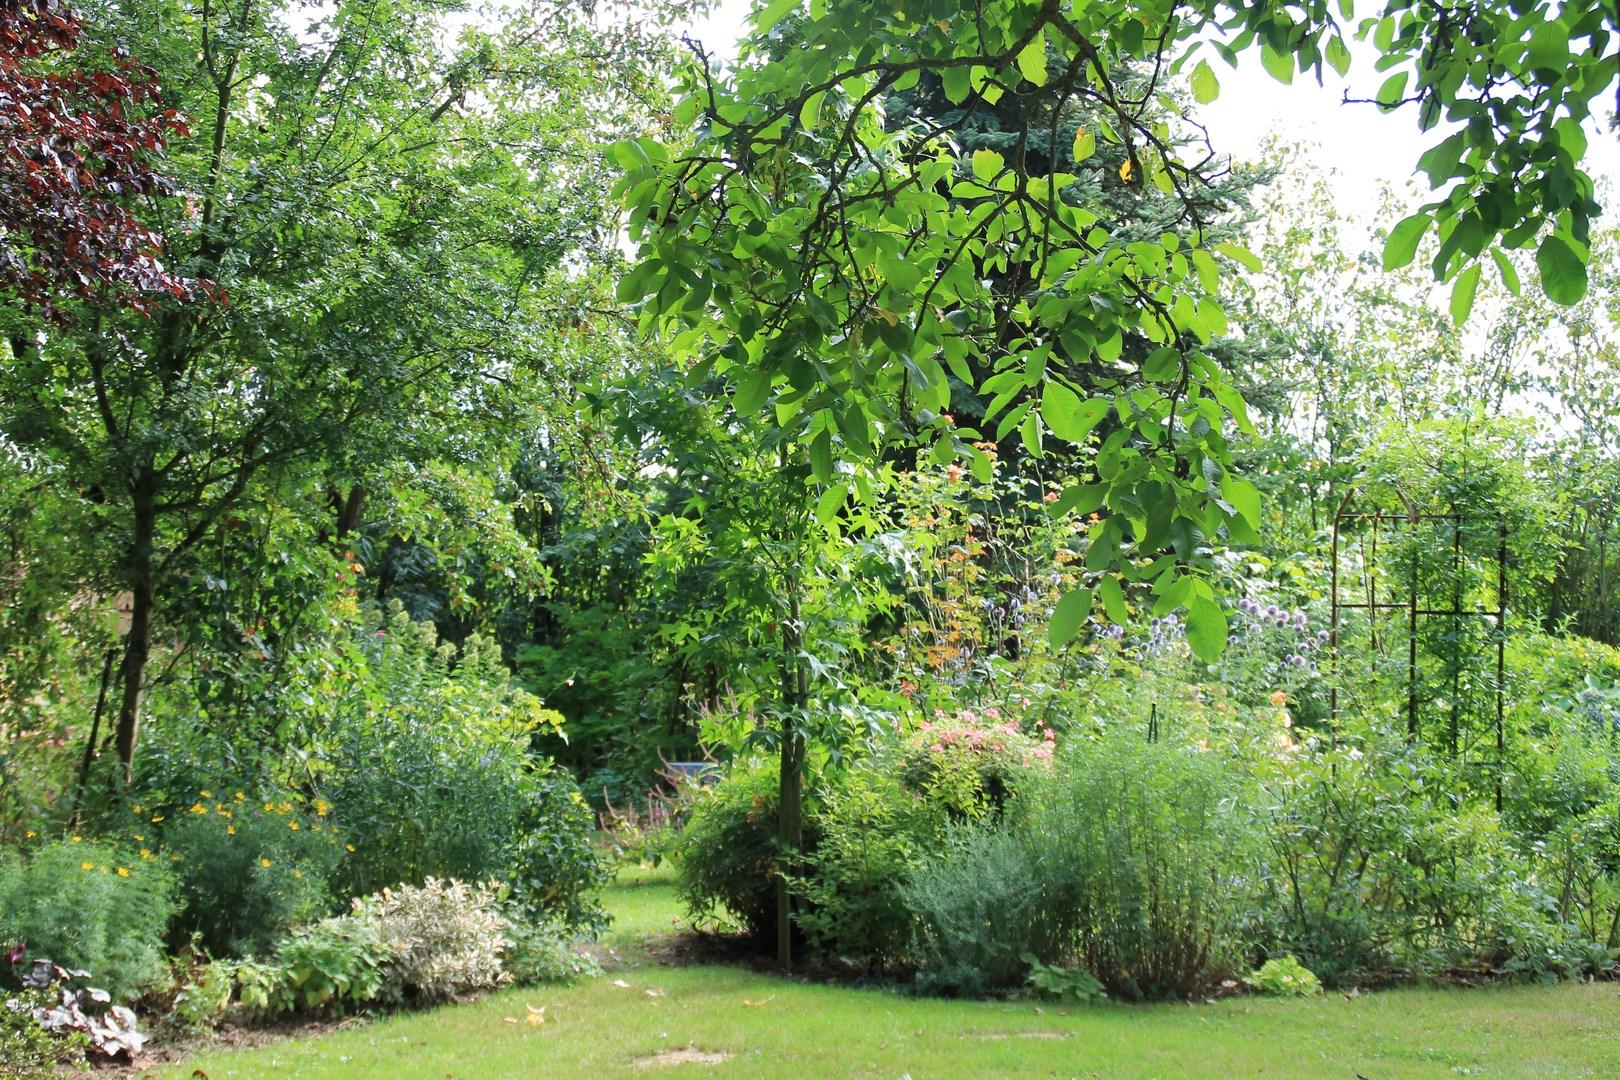 Le jardin de val rie r verie au jardin for Andy tauer reverie au jardin